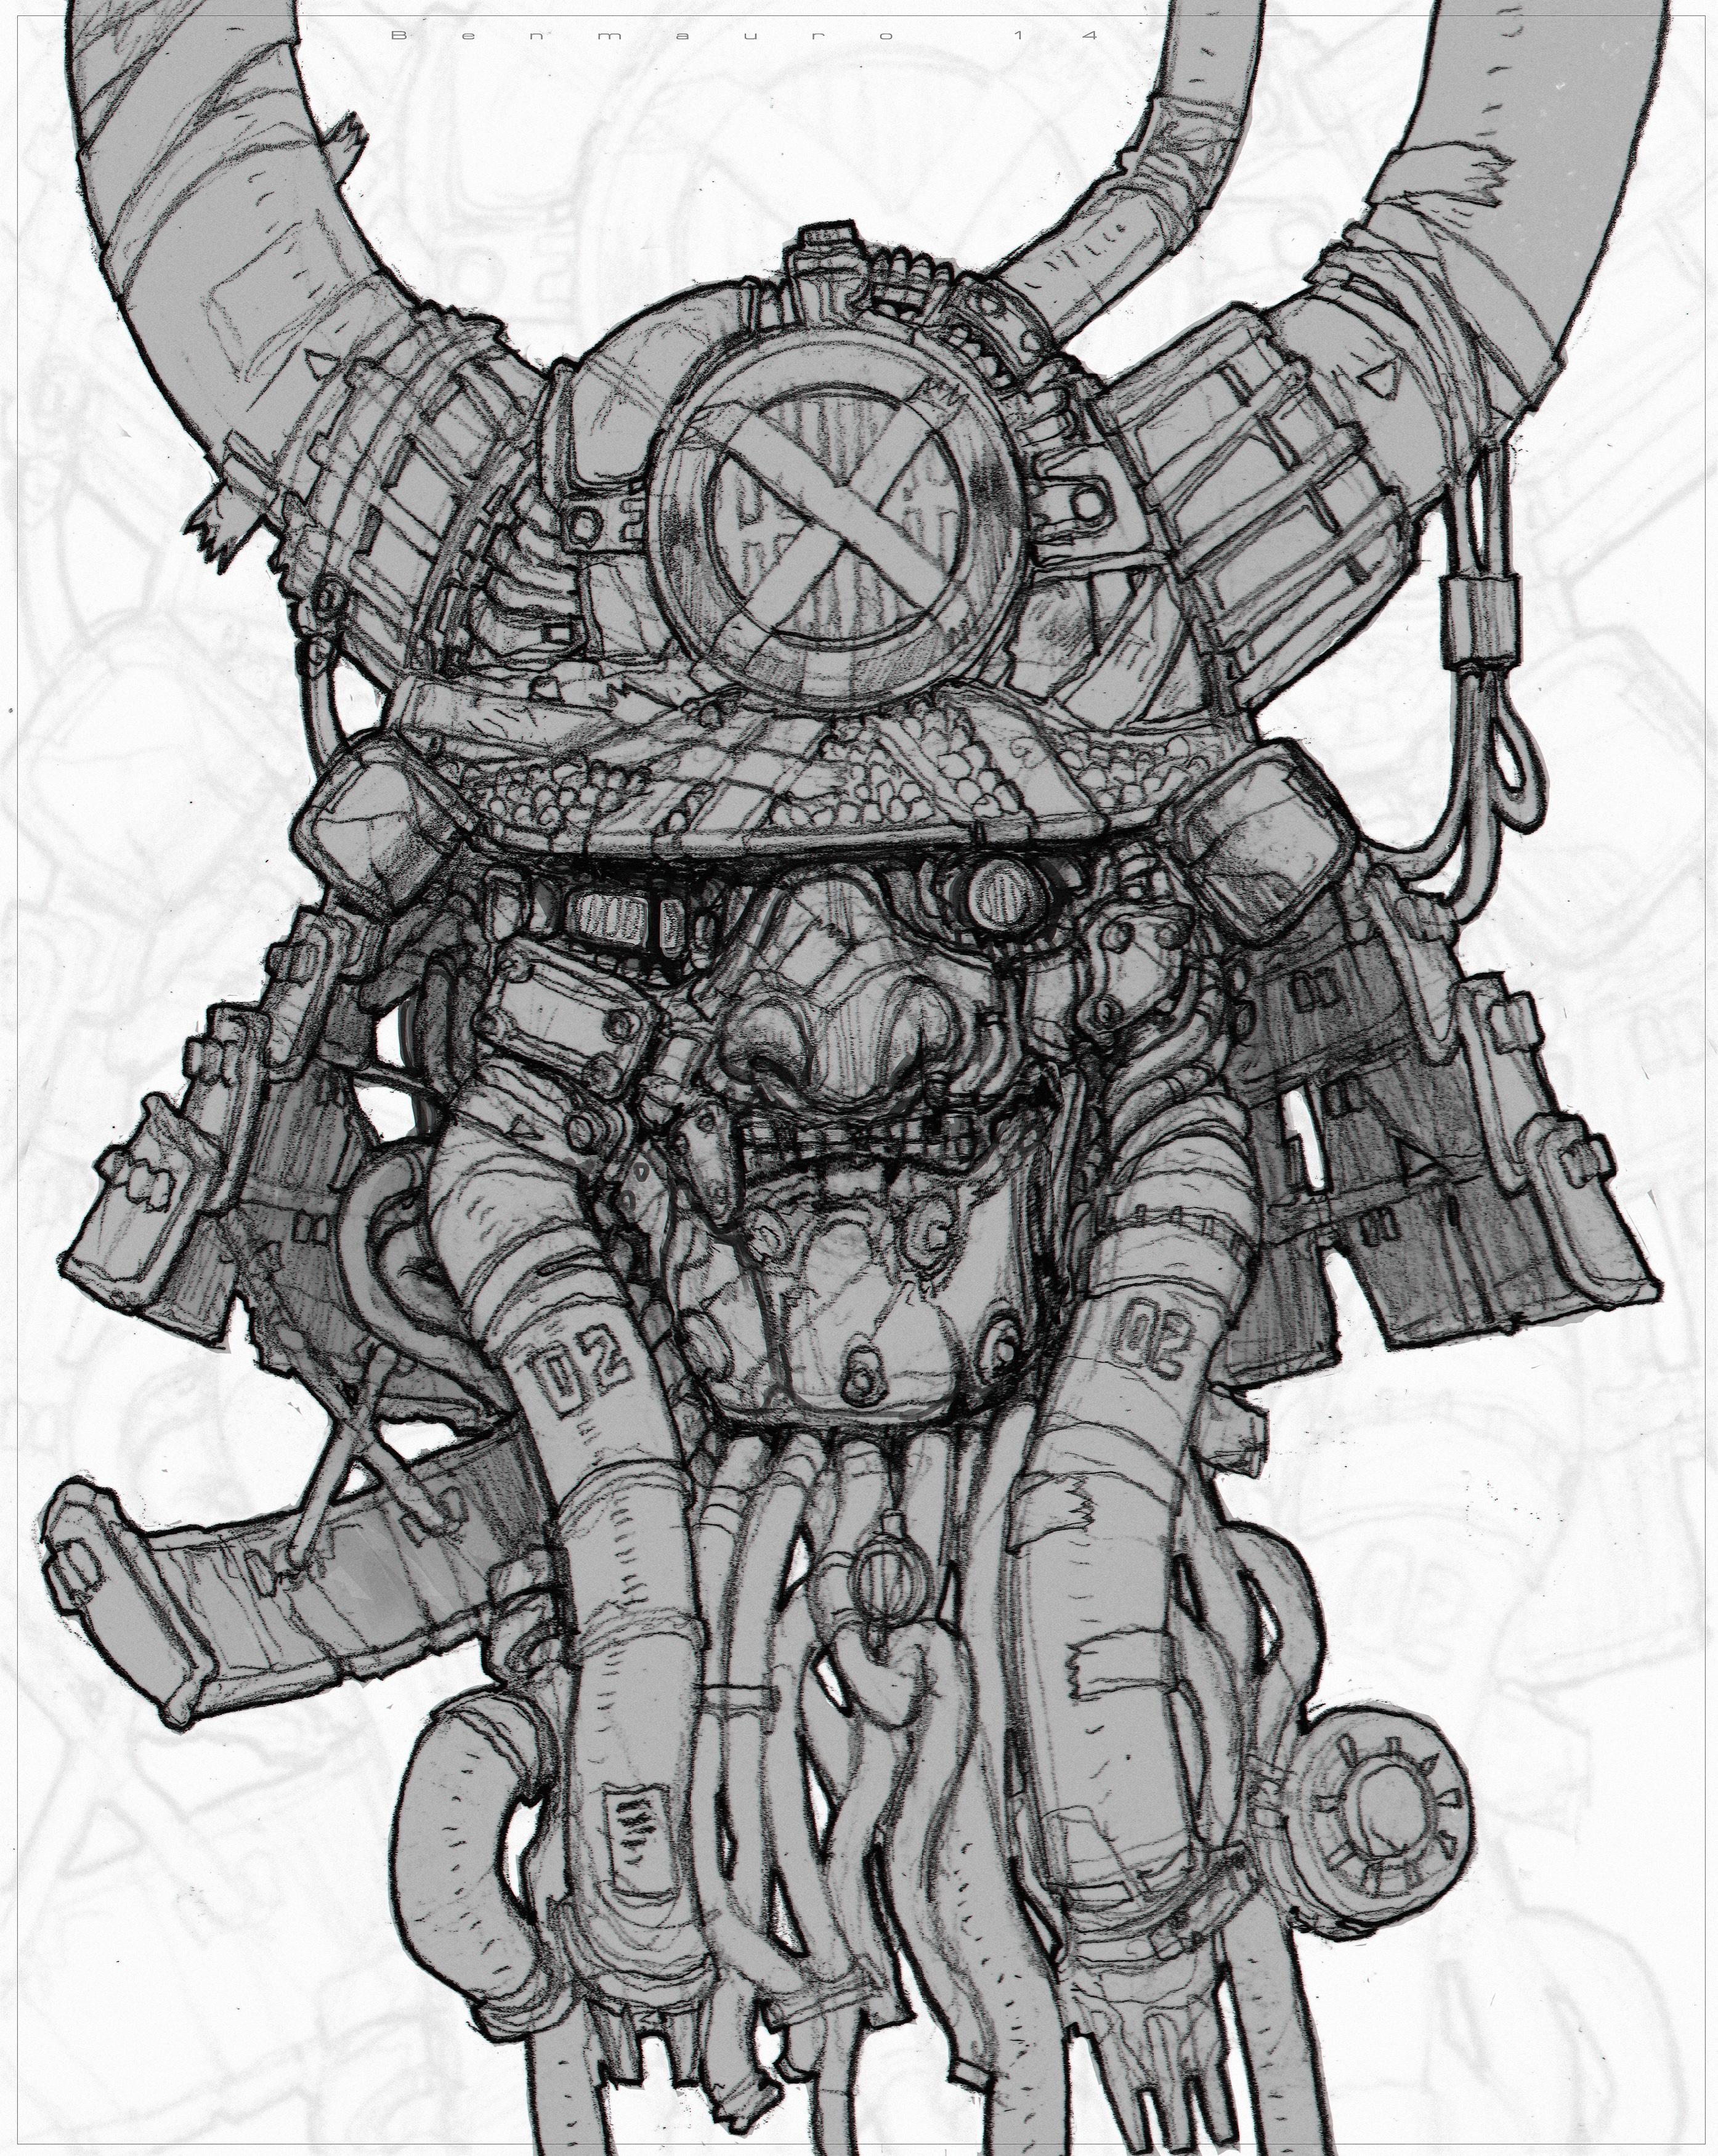 Drawn samurai robot samurai On Samurai Junk @DeviantArt